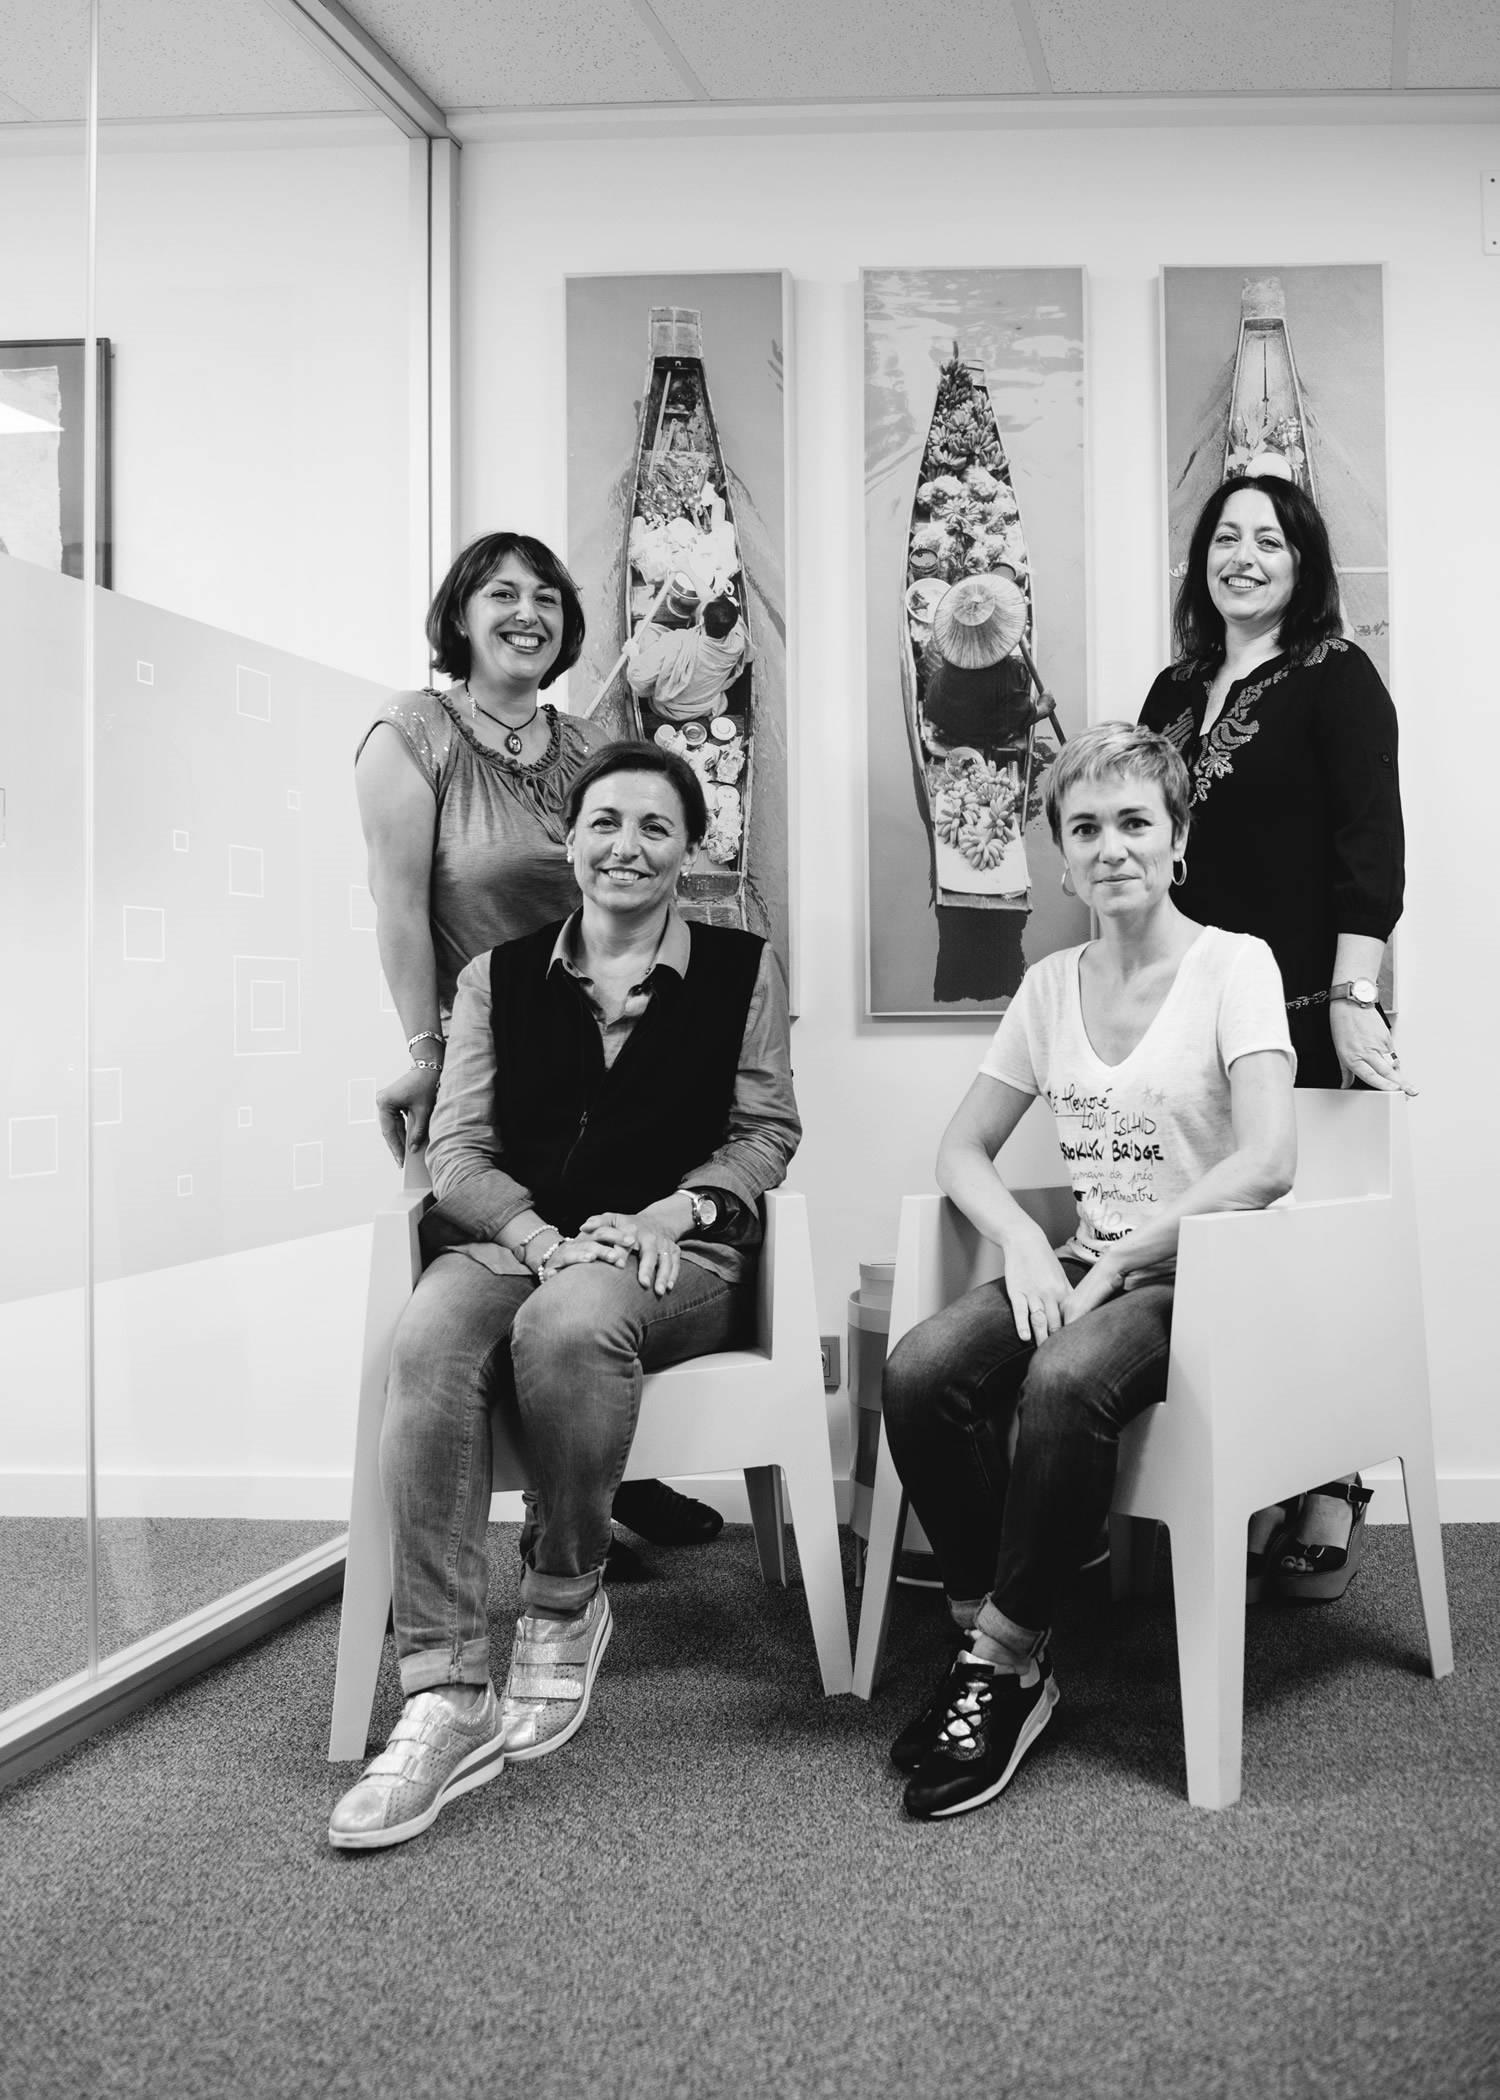 Kursaal Asesores, 20 años de experiencia en creación de empresas